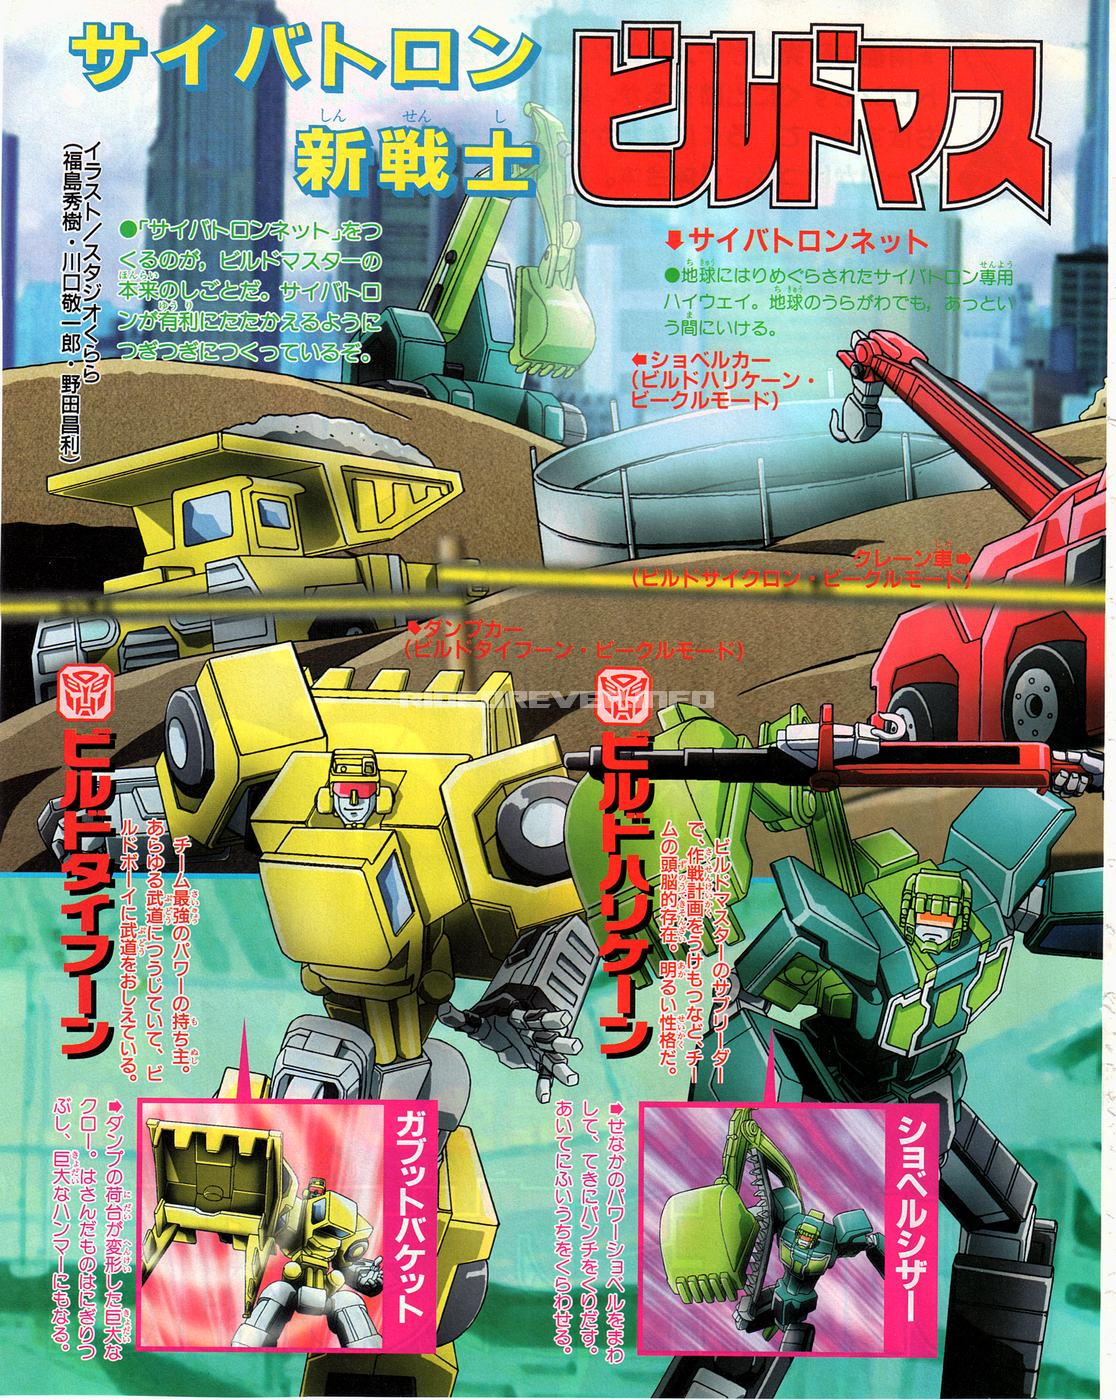 TV Magazine 2000-09-4